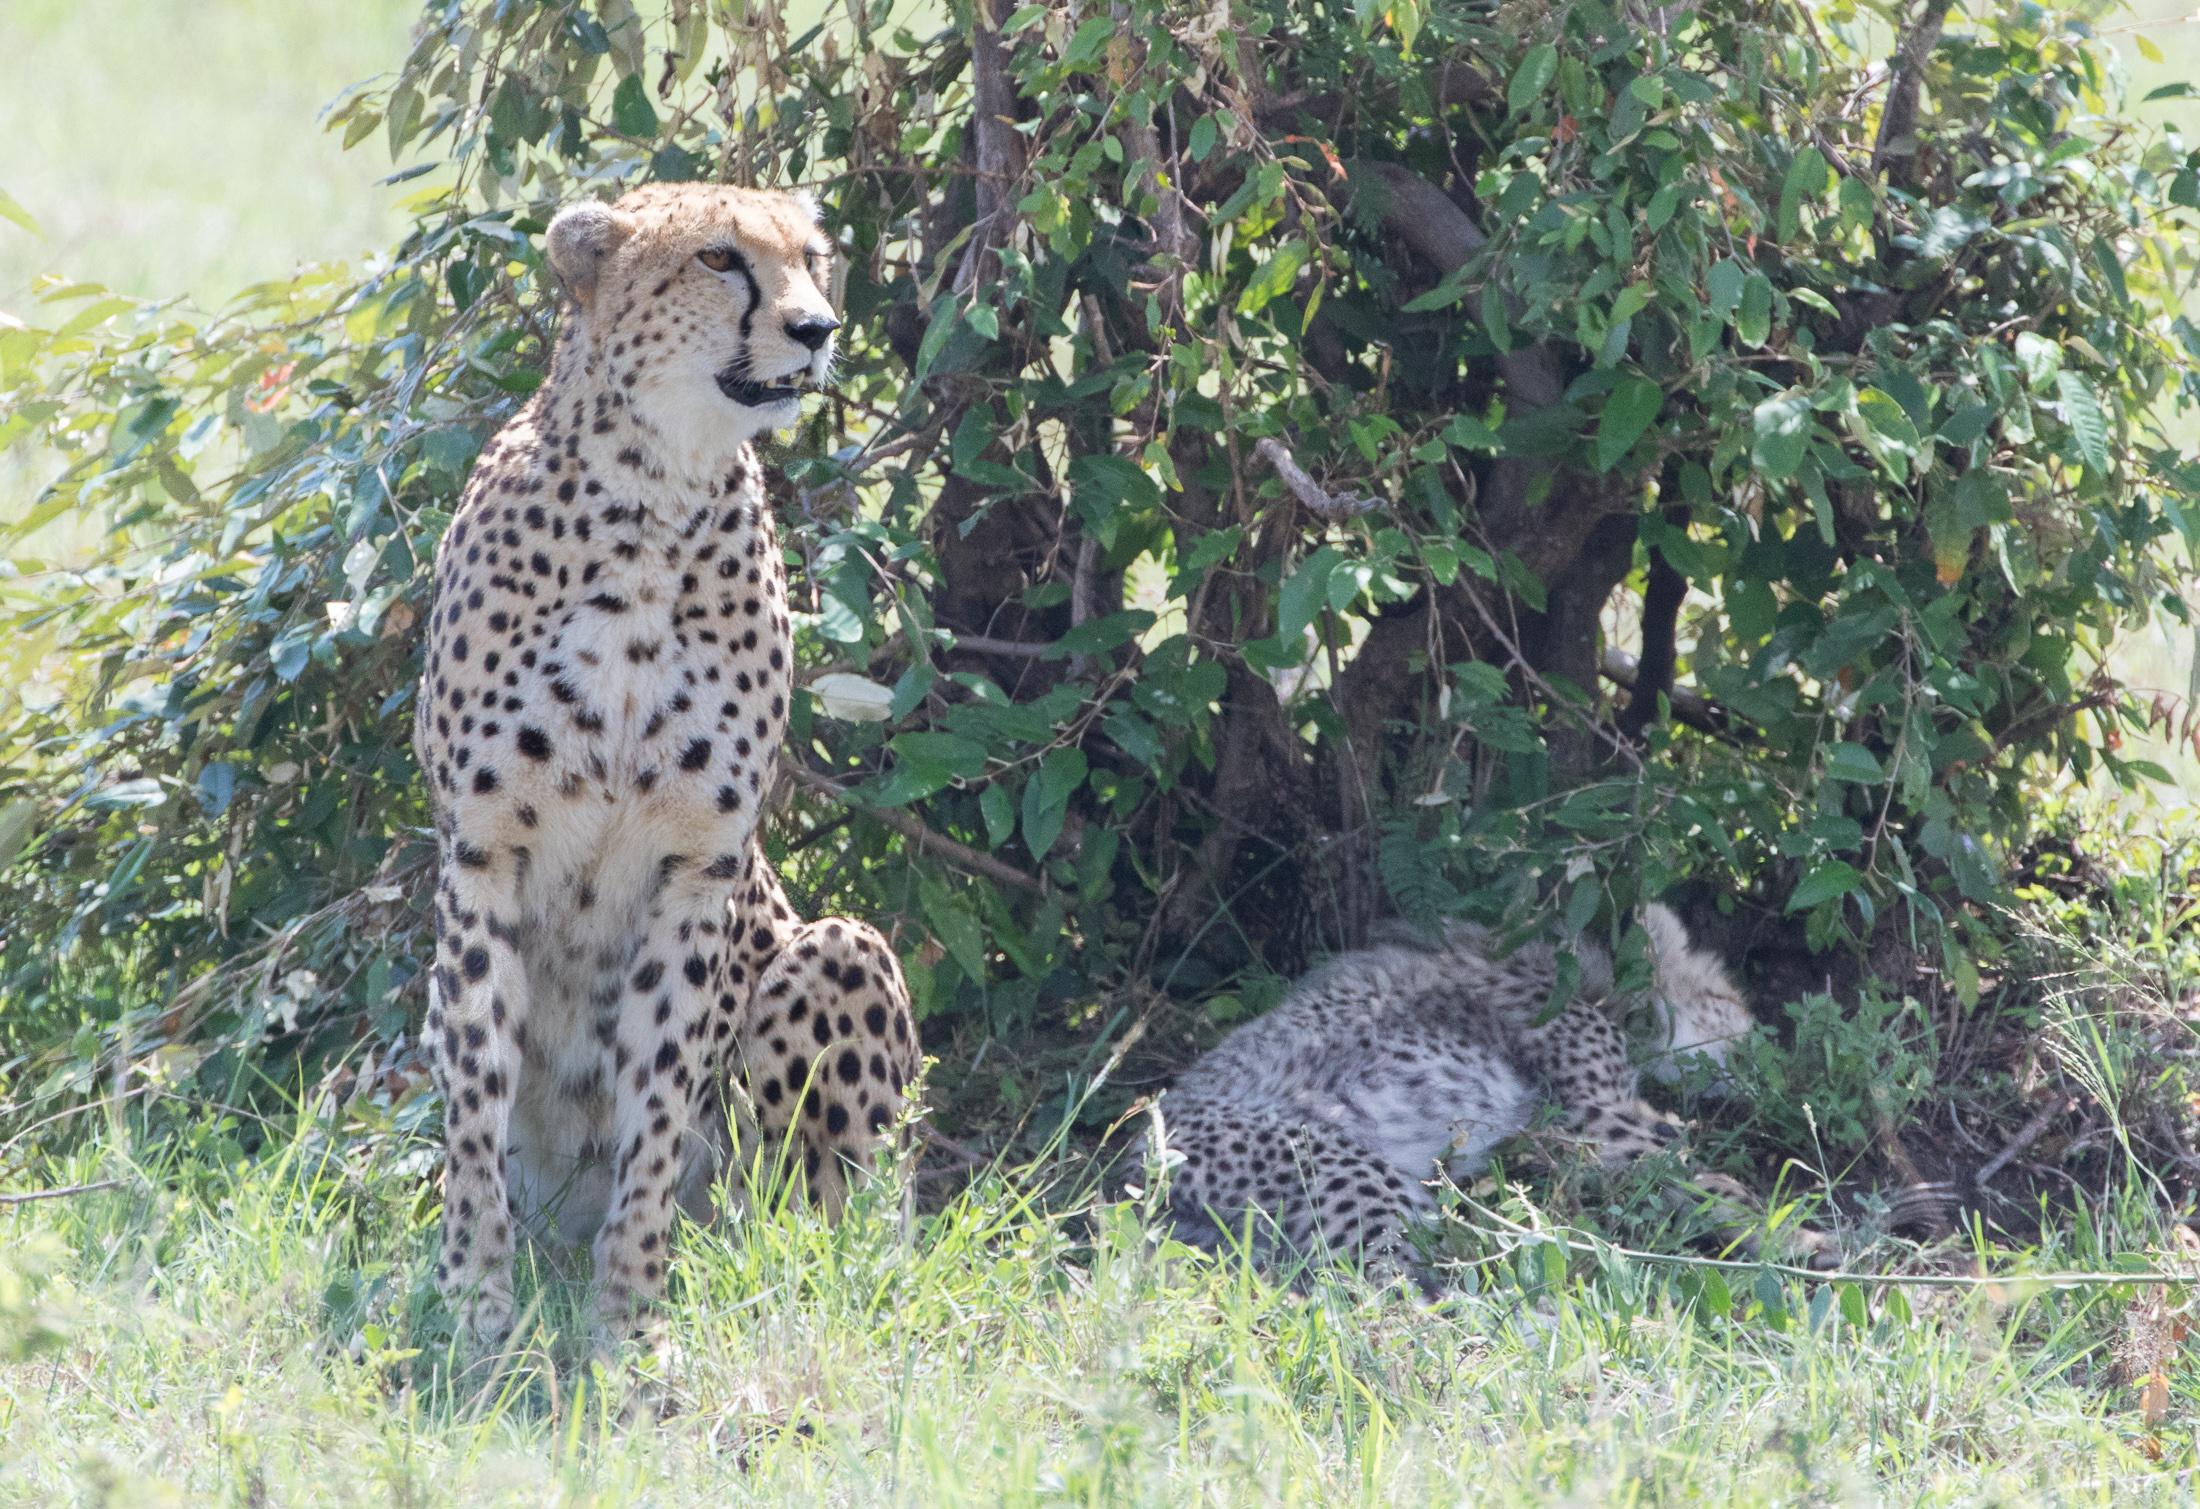 Female cheetah and cub. © Haydn Williams 2019